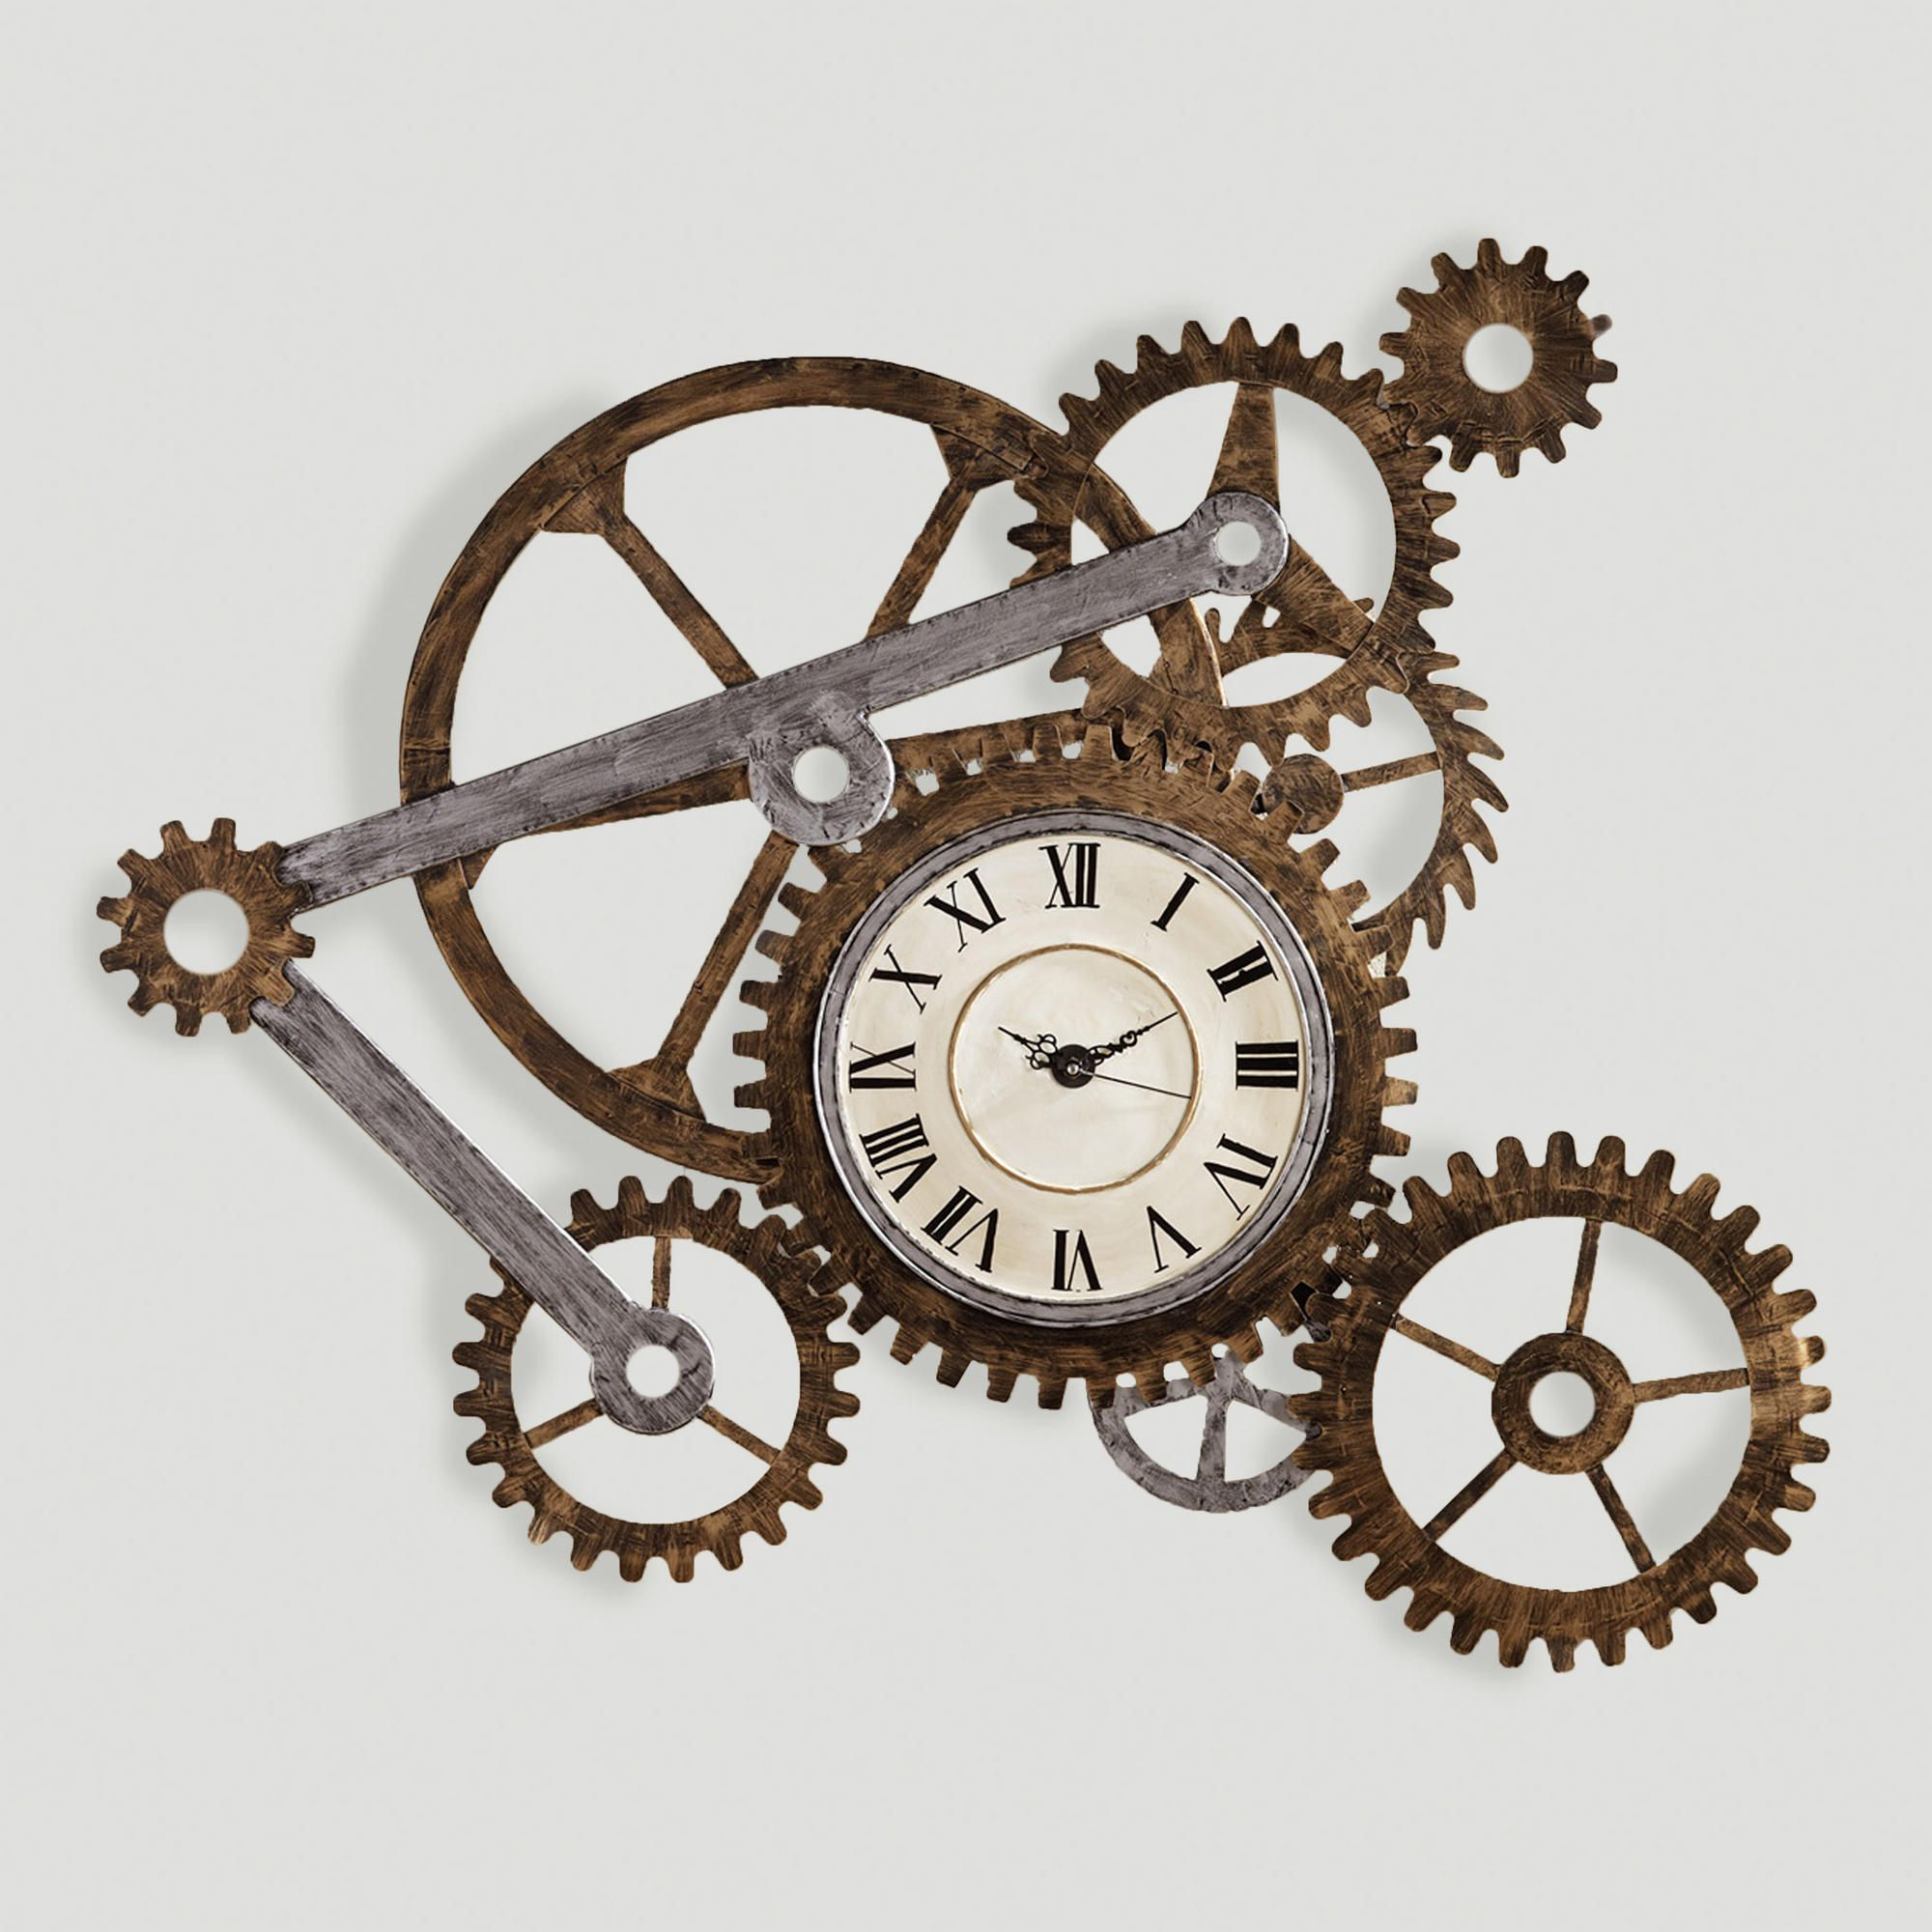 Scenic Gears Clock Art Repinned By Gears Clock Art Repinned By A Coffee Art Clock Clock Artwork furniture Cool Clock Art